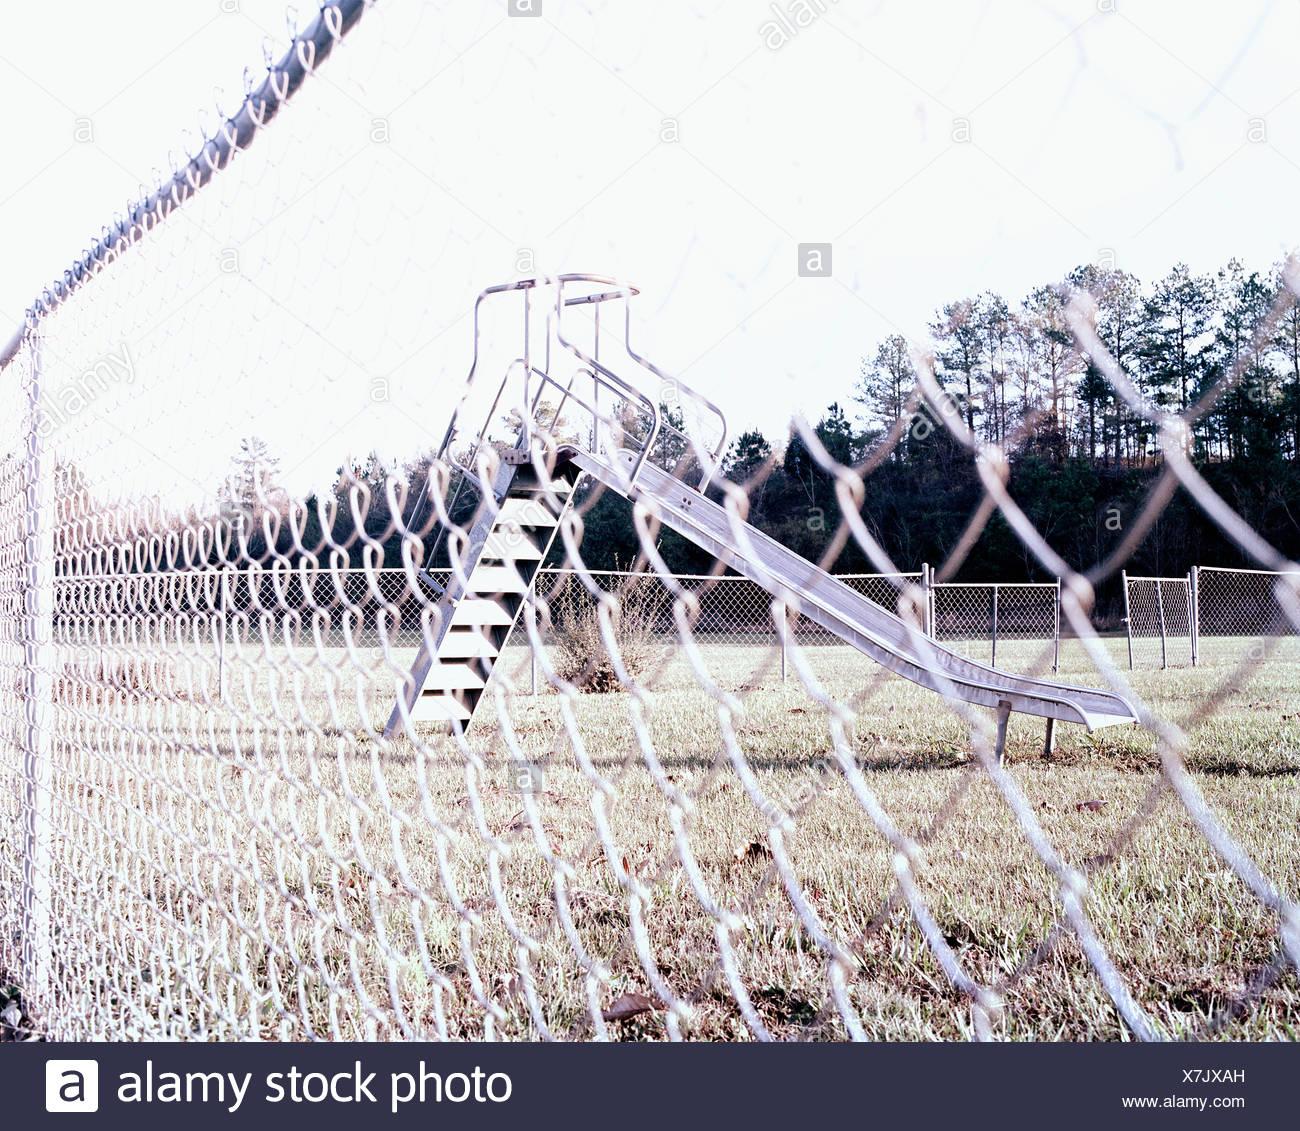 Área infantil a través del eslabón de la cadena cerco Imagen De Stock